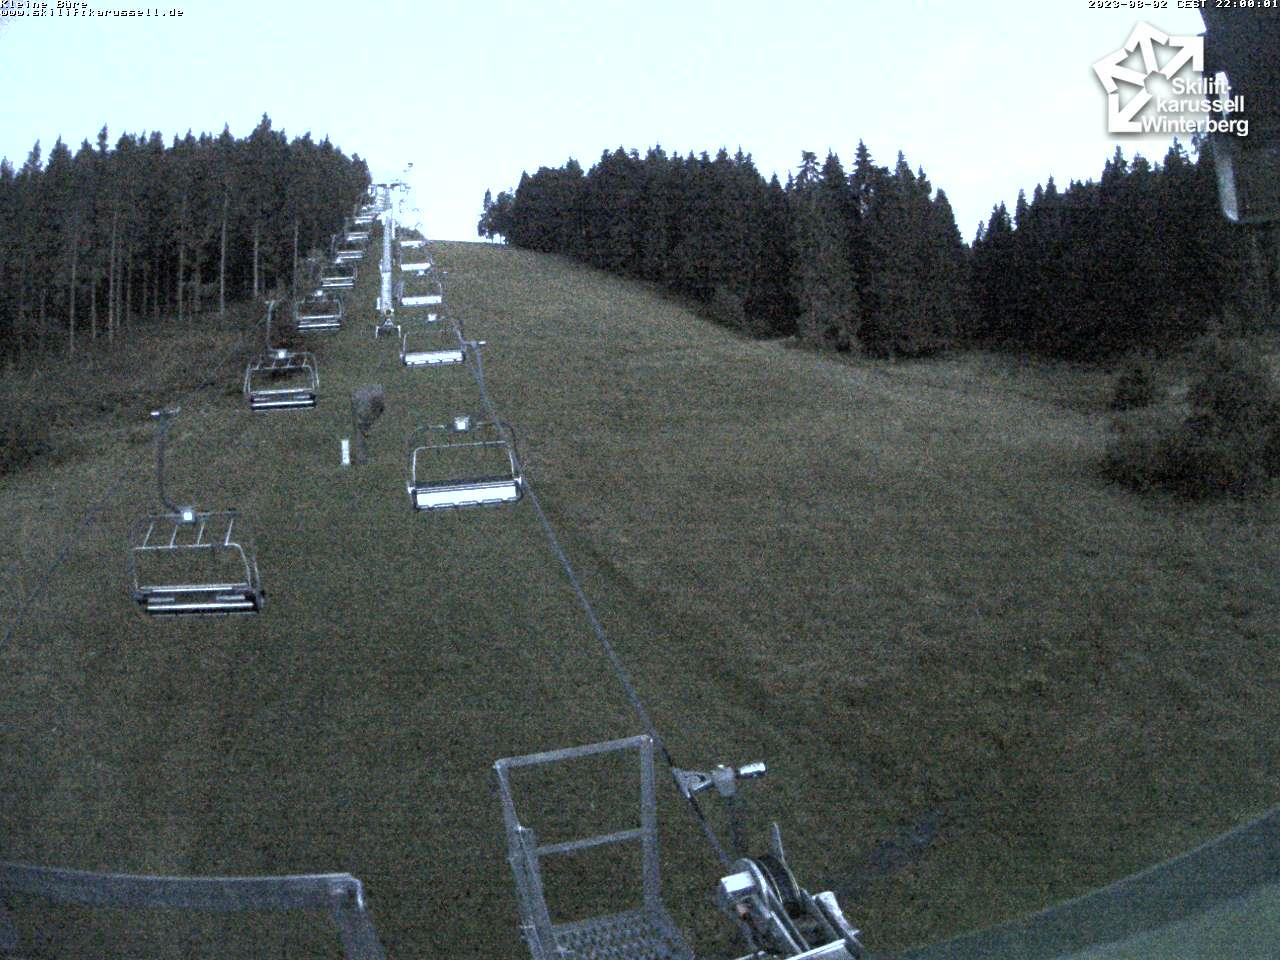 Webcam Kleine Büre - Skiliftkarussell Winterberg